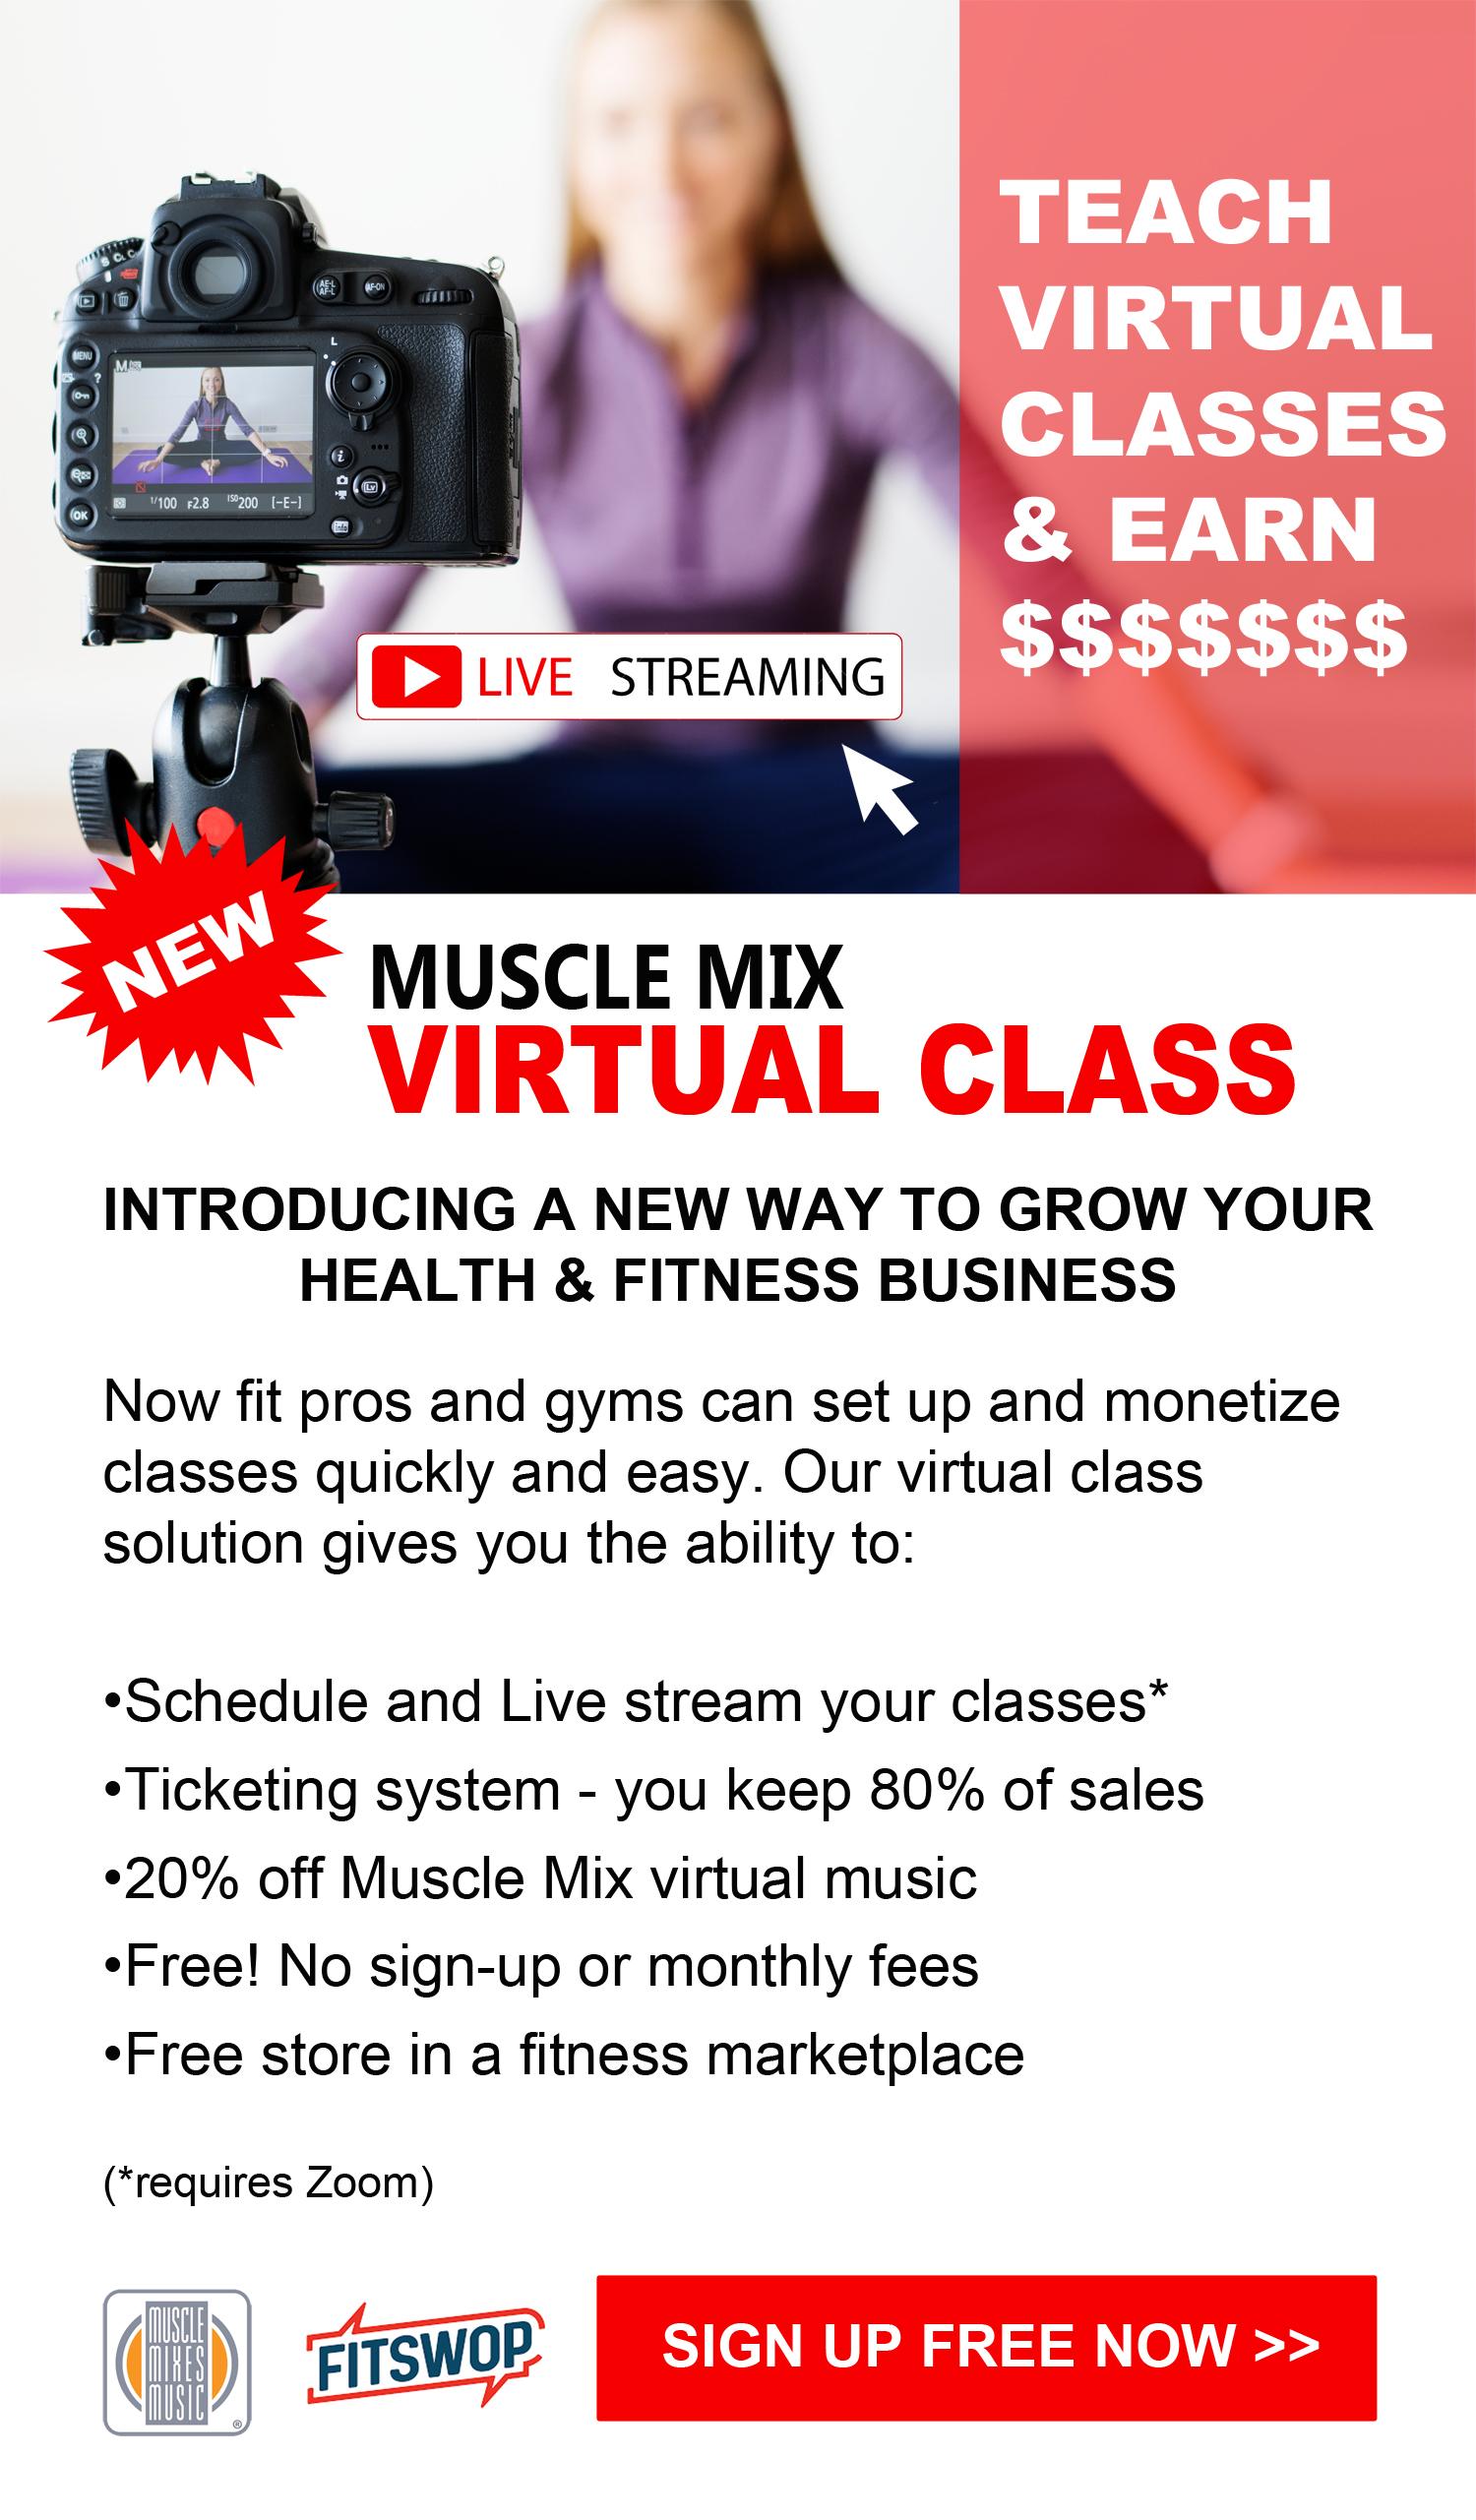 mm-virtual-class-ad-sm.jpg